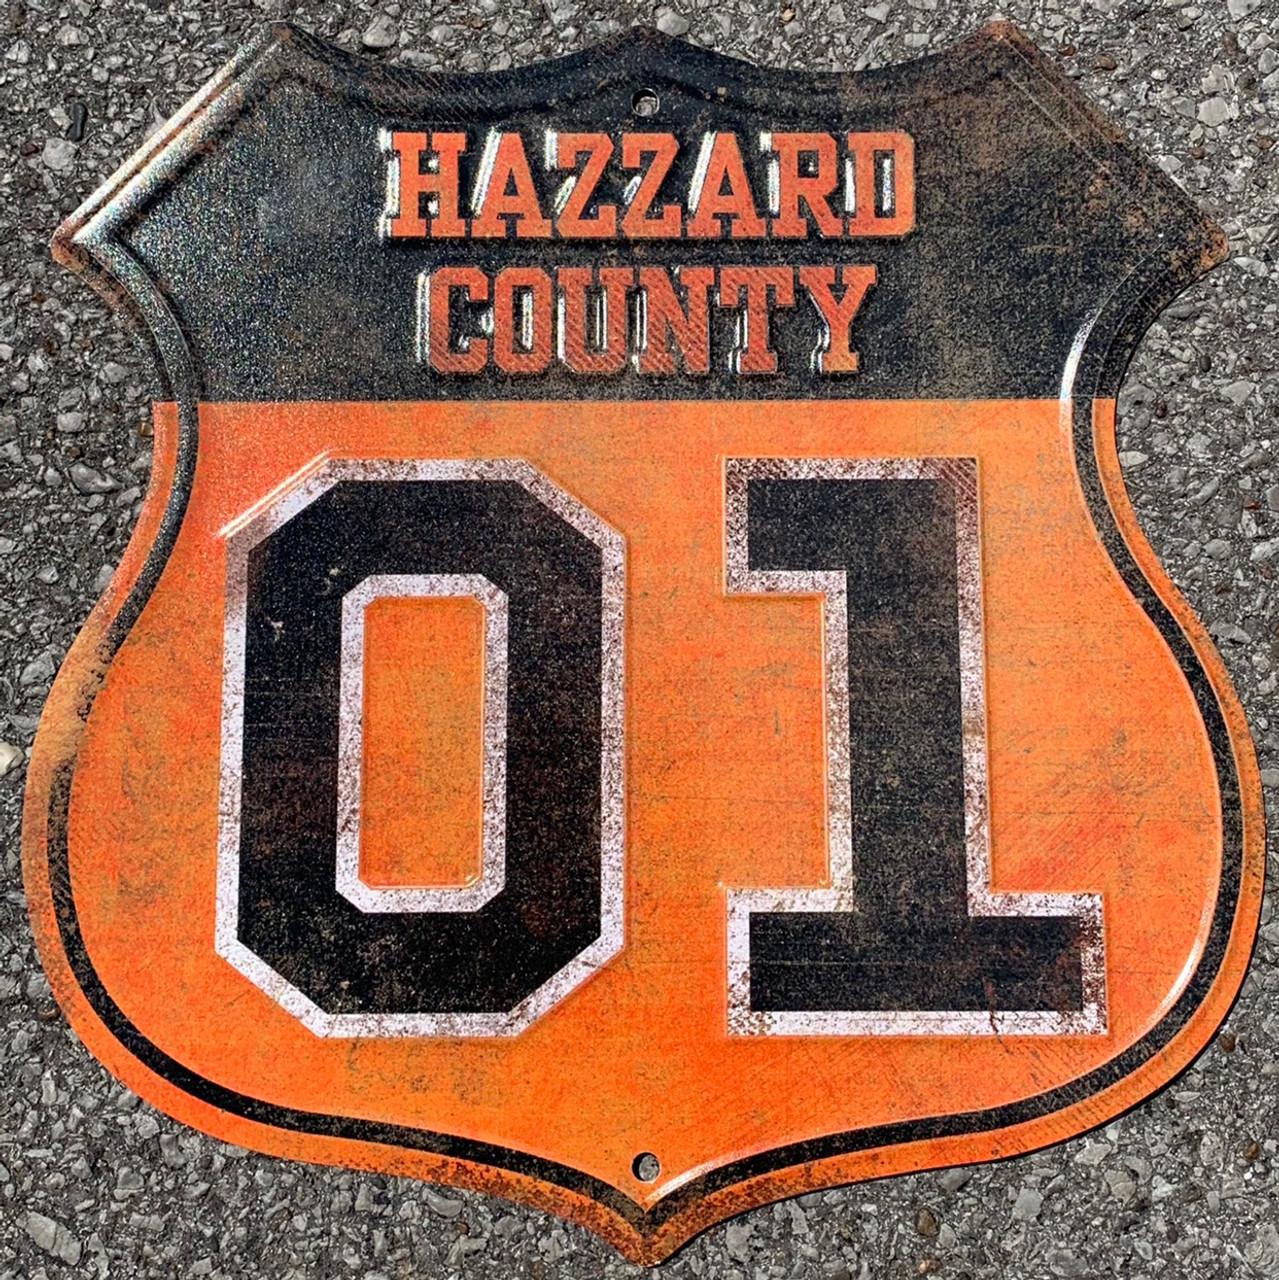 Rustic Hazzard County Road Metal Sign